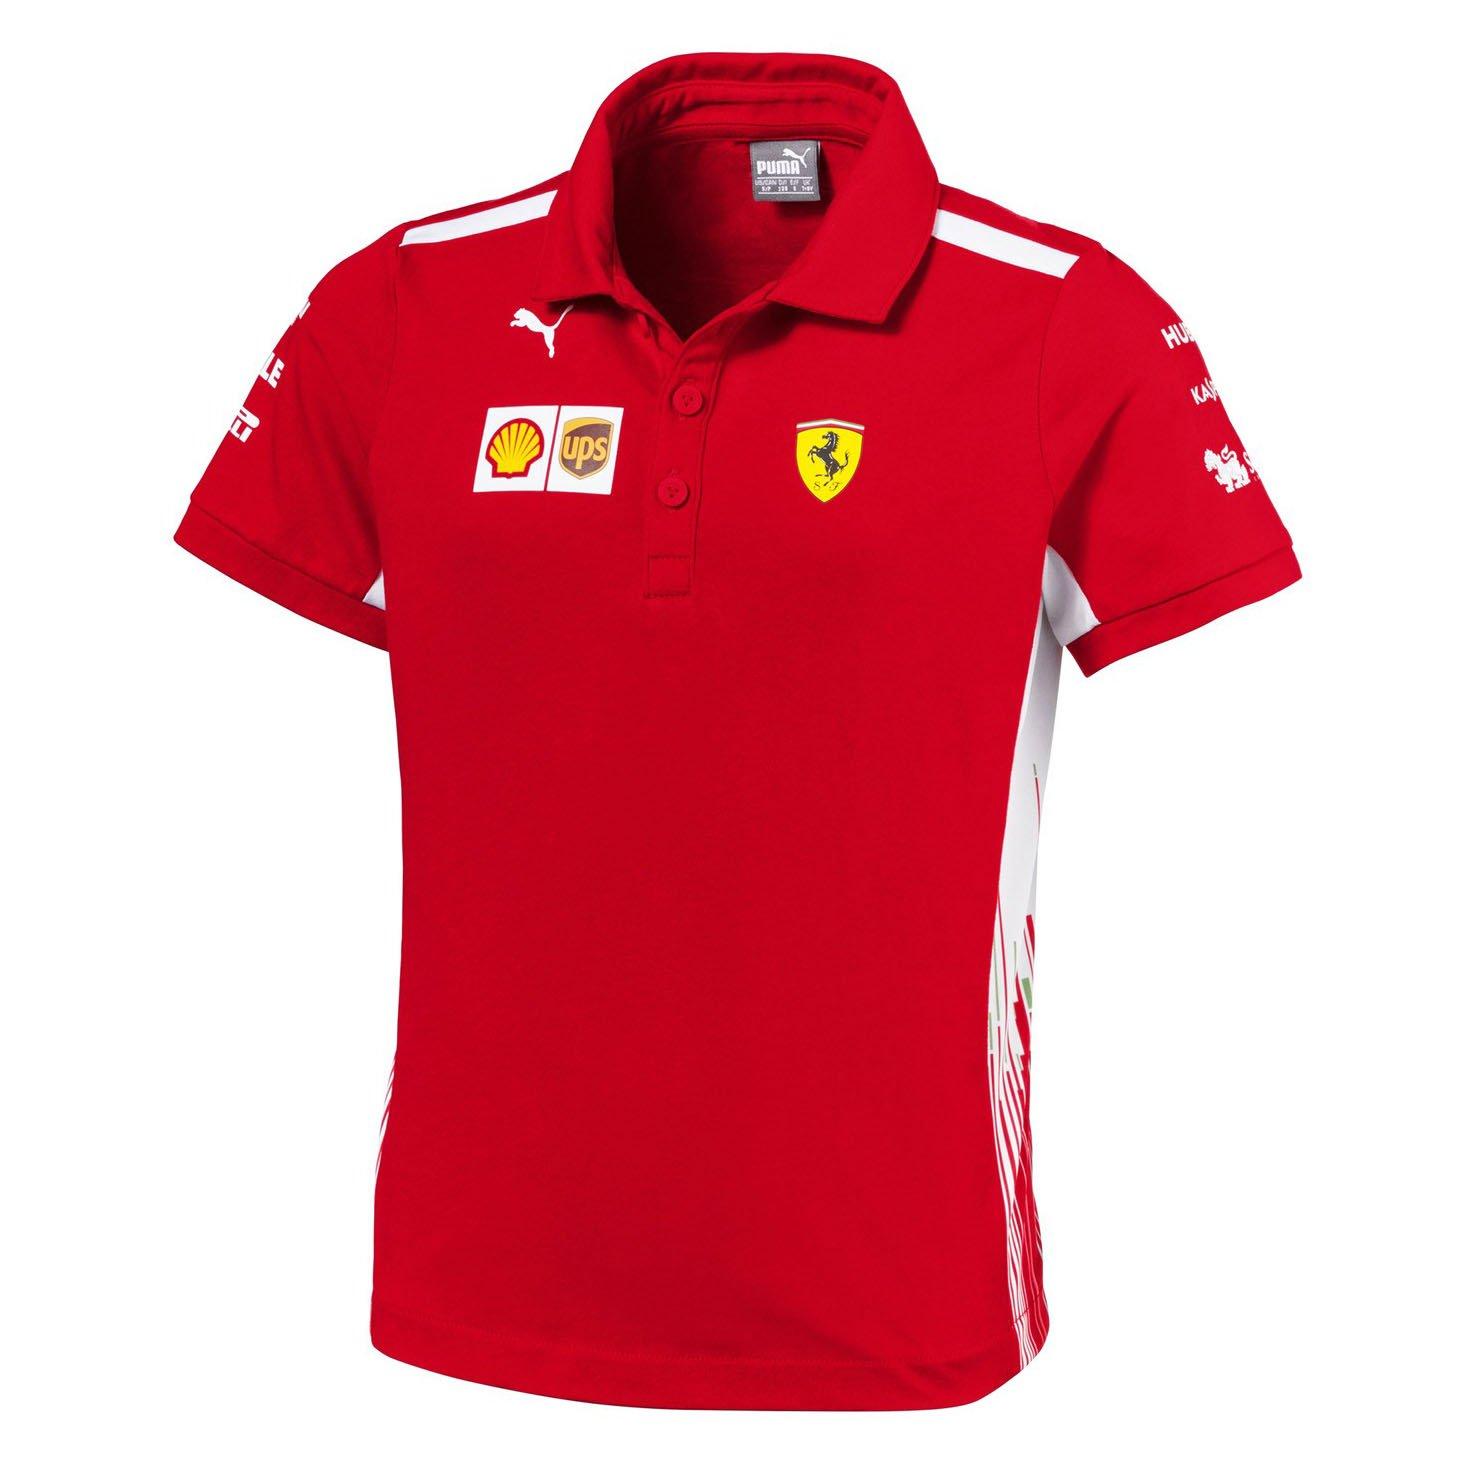 81b37b9ed 2018 Scuderia Ferrari F1 Team Childrens Polo Shirt Kids Boys Sizes Ages  7-14yrs: Amazon.co.uk: Sports & Outdoors